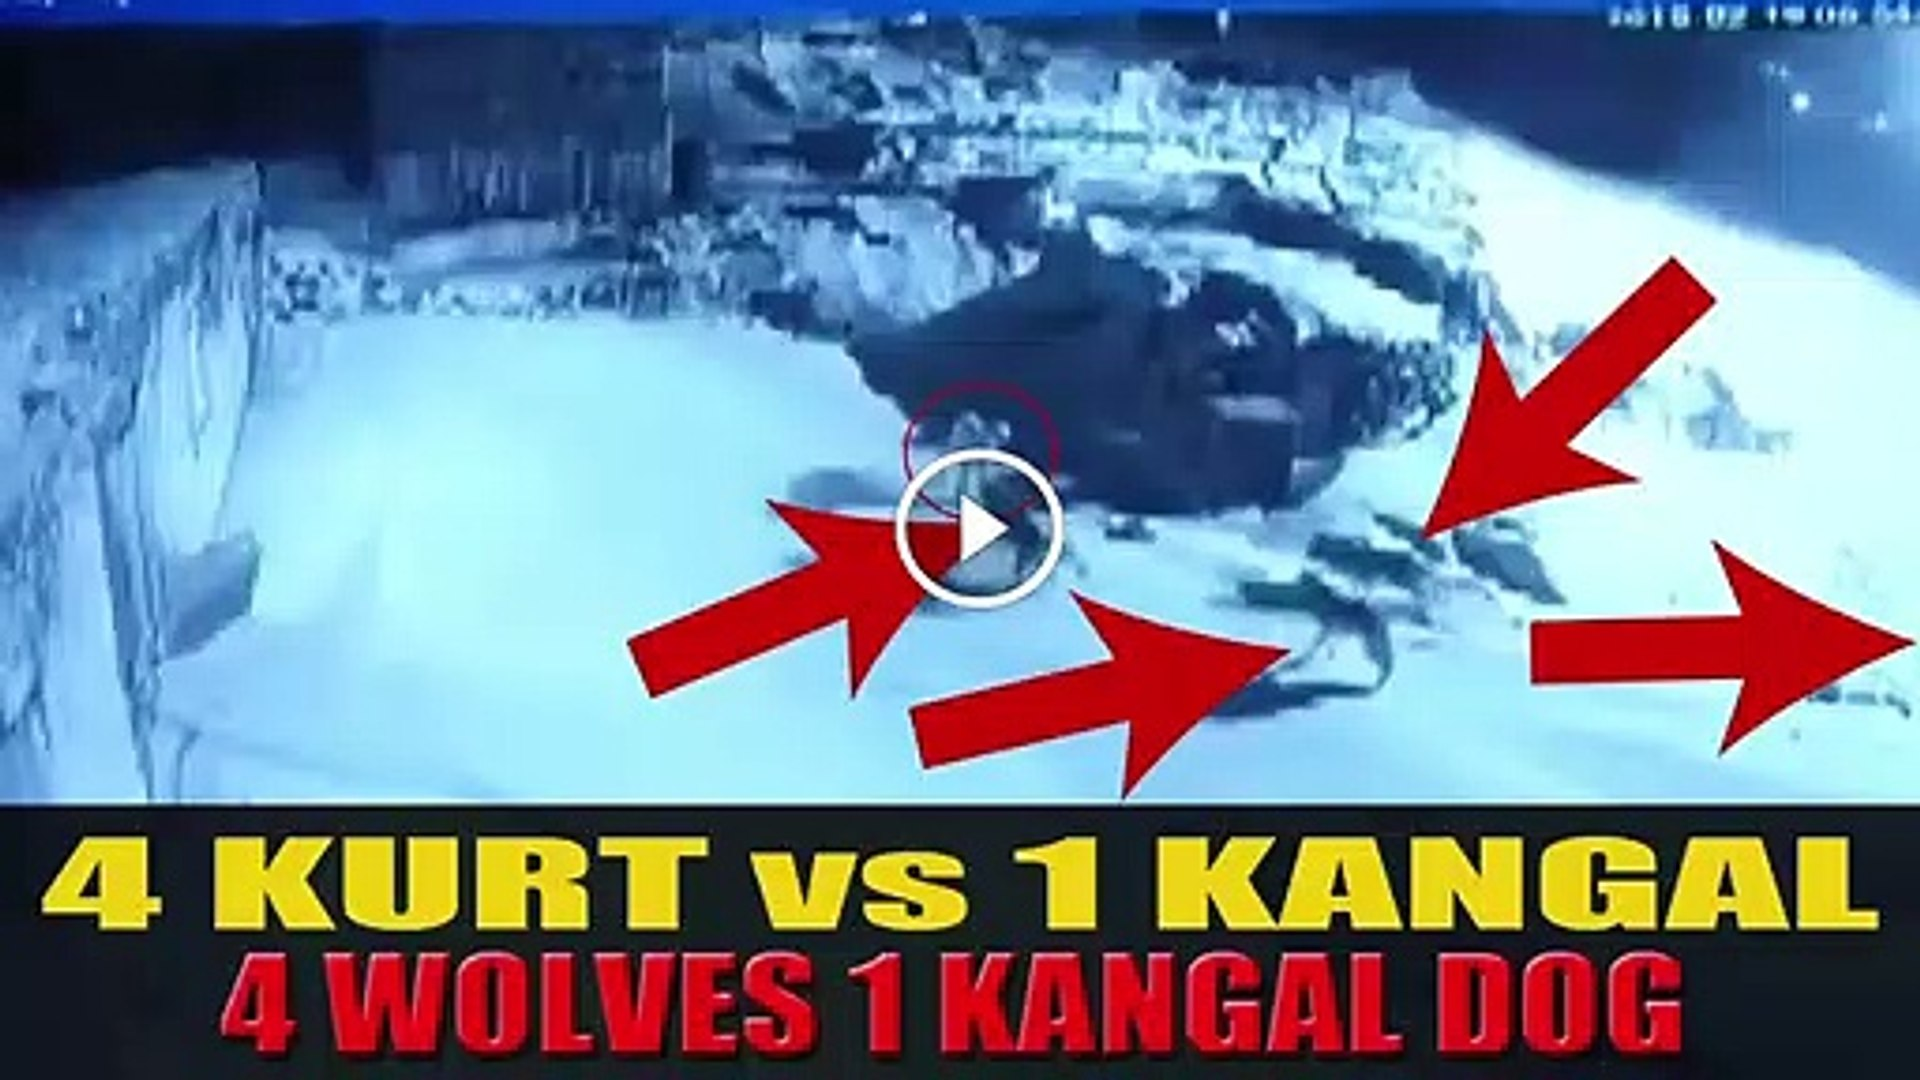 4 KURT 1 SiVAS KANGALA SALDIRIRSA - 4 WOLVES vs 1 KANGAL DOG